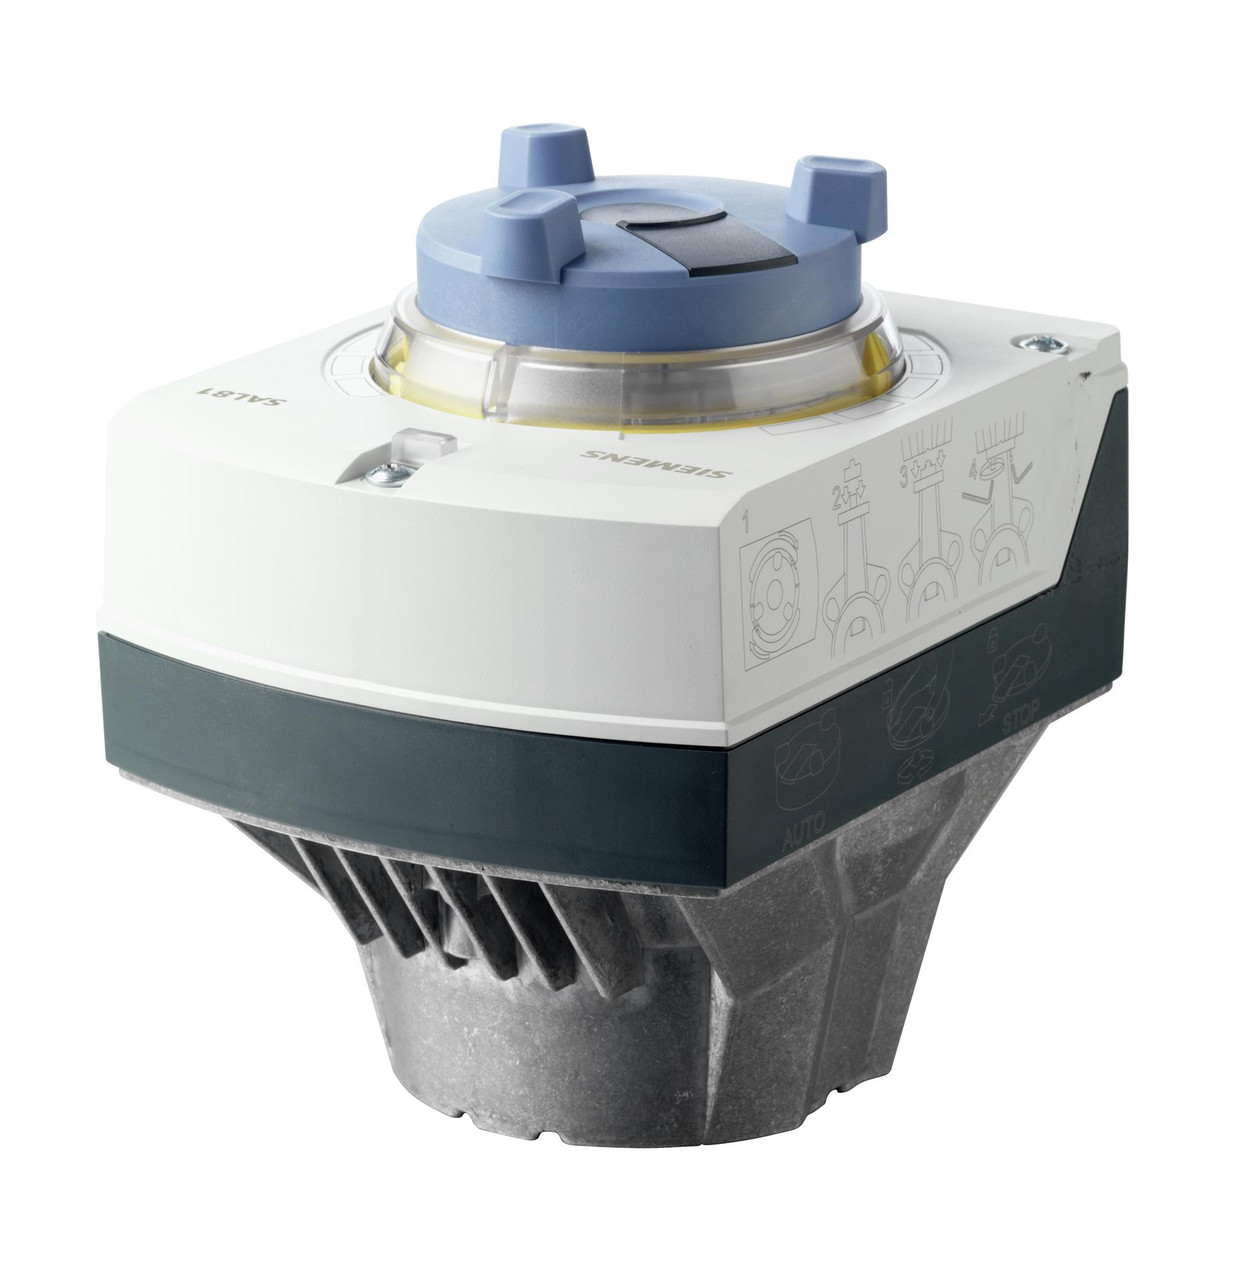 Siemens SAL81.03T10, S55162-A105, Electromotoric actuator